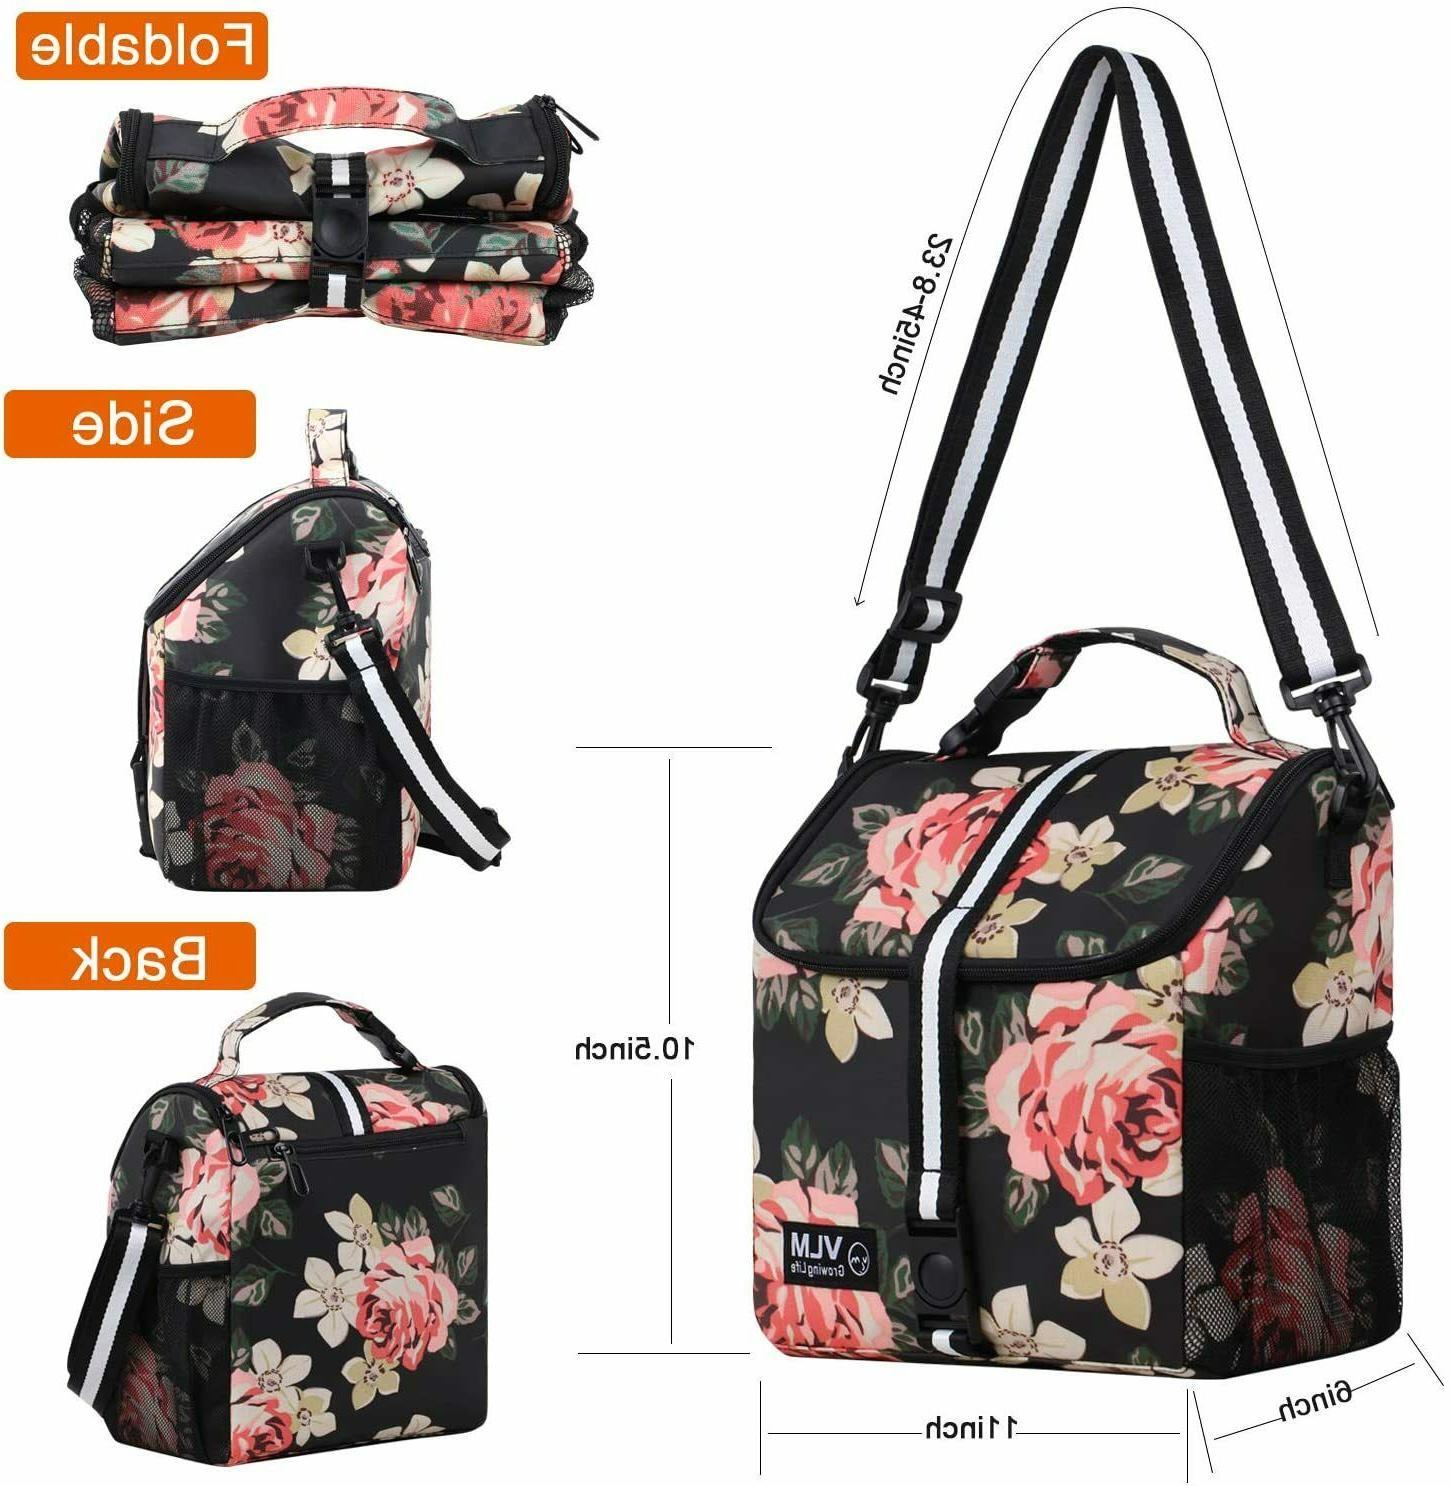 Lunch Bag for Adjustable Shoulder Insulated Box